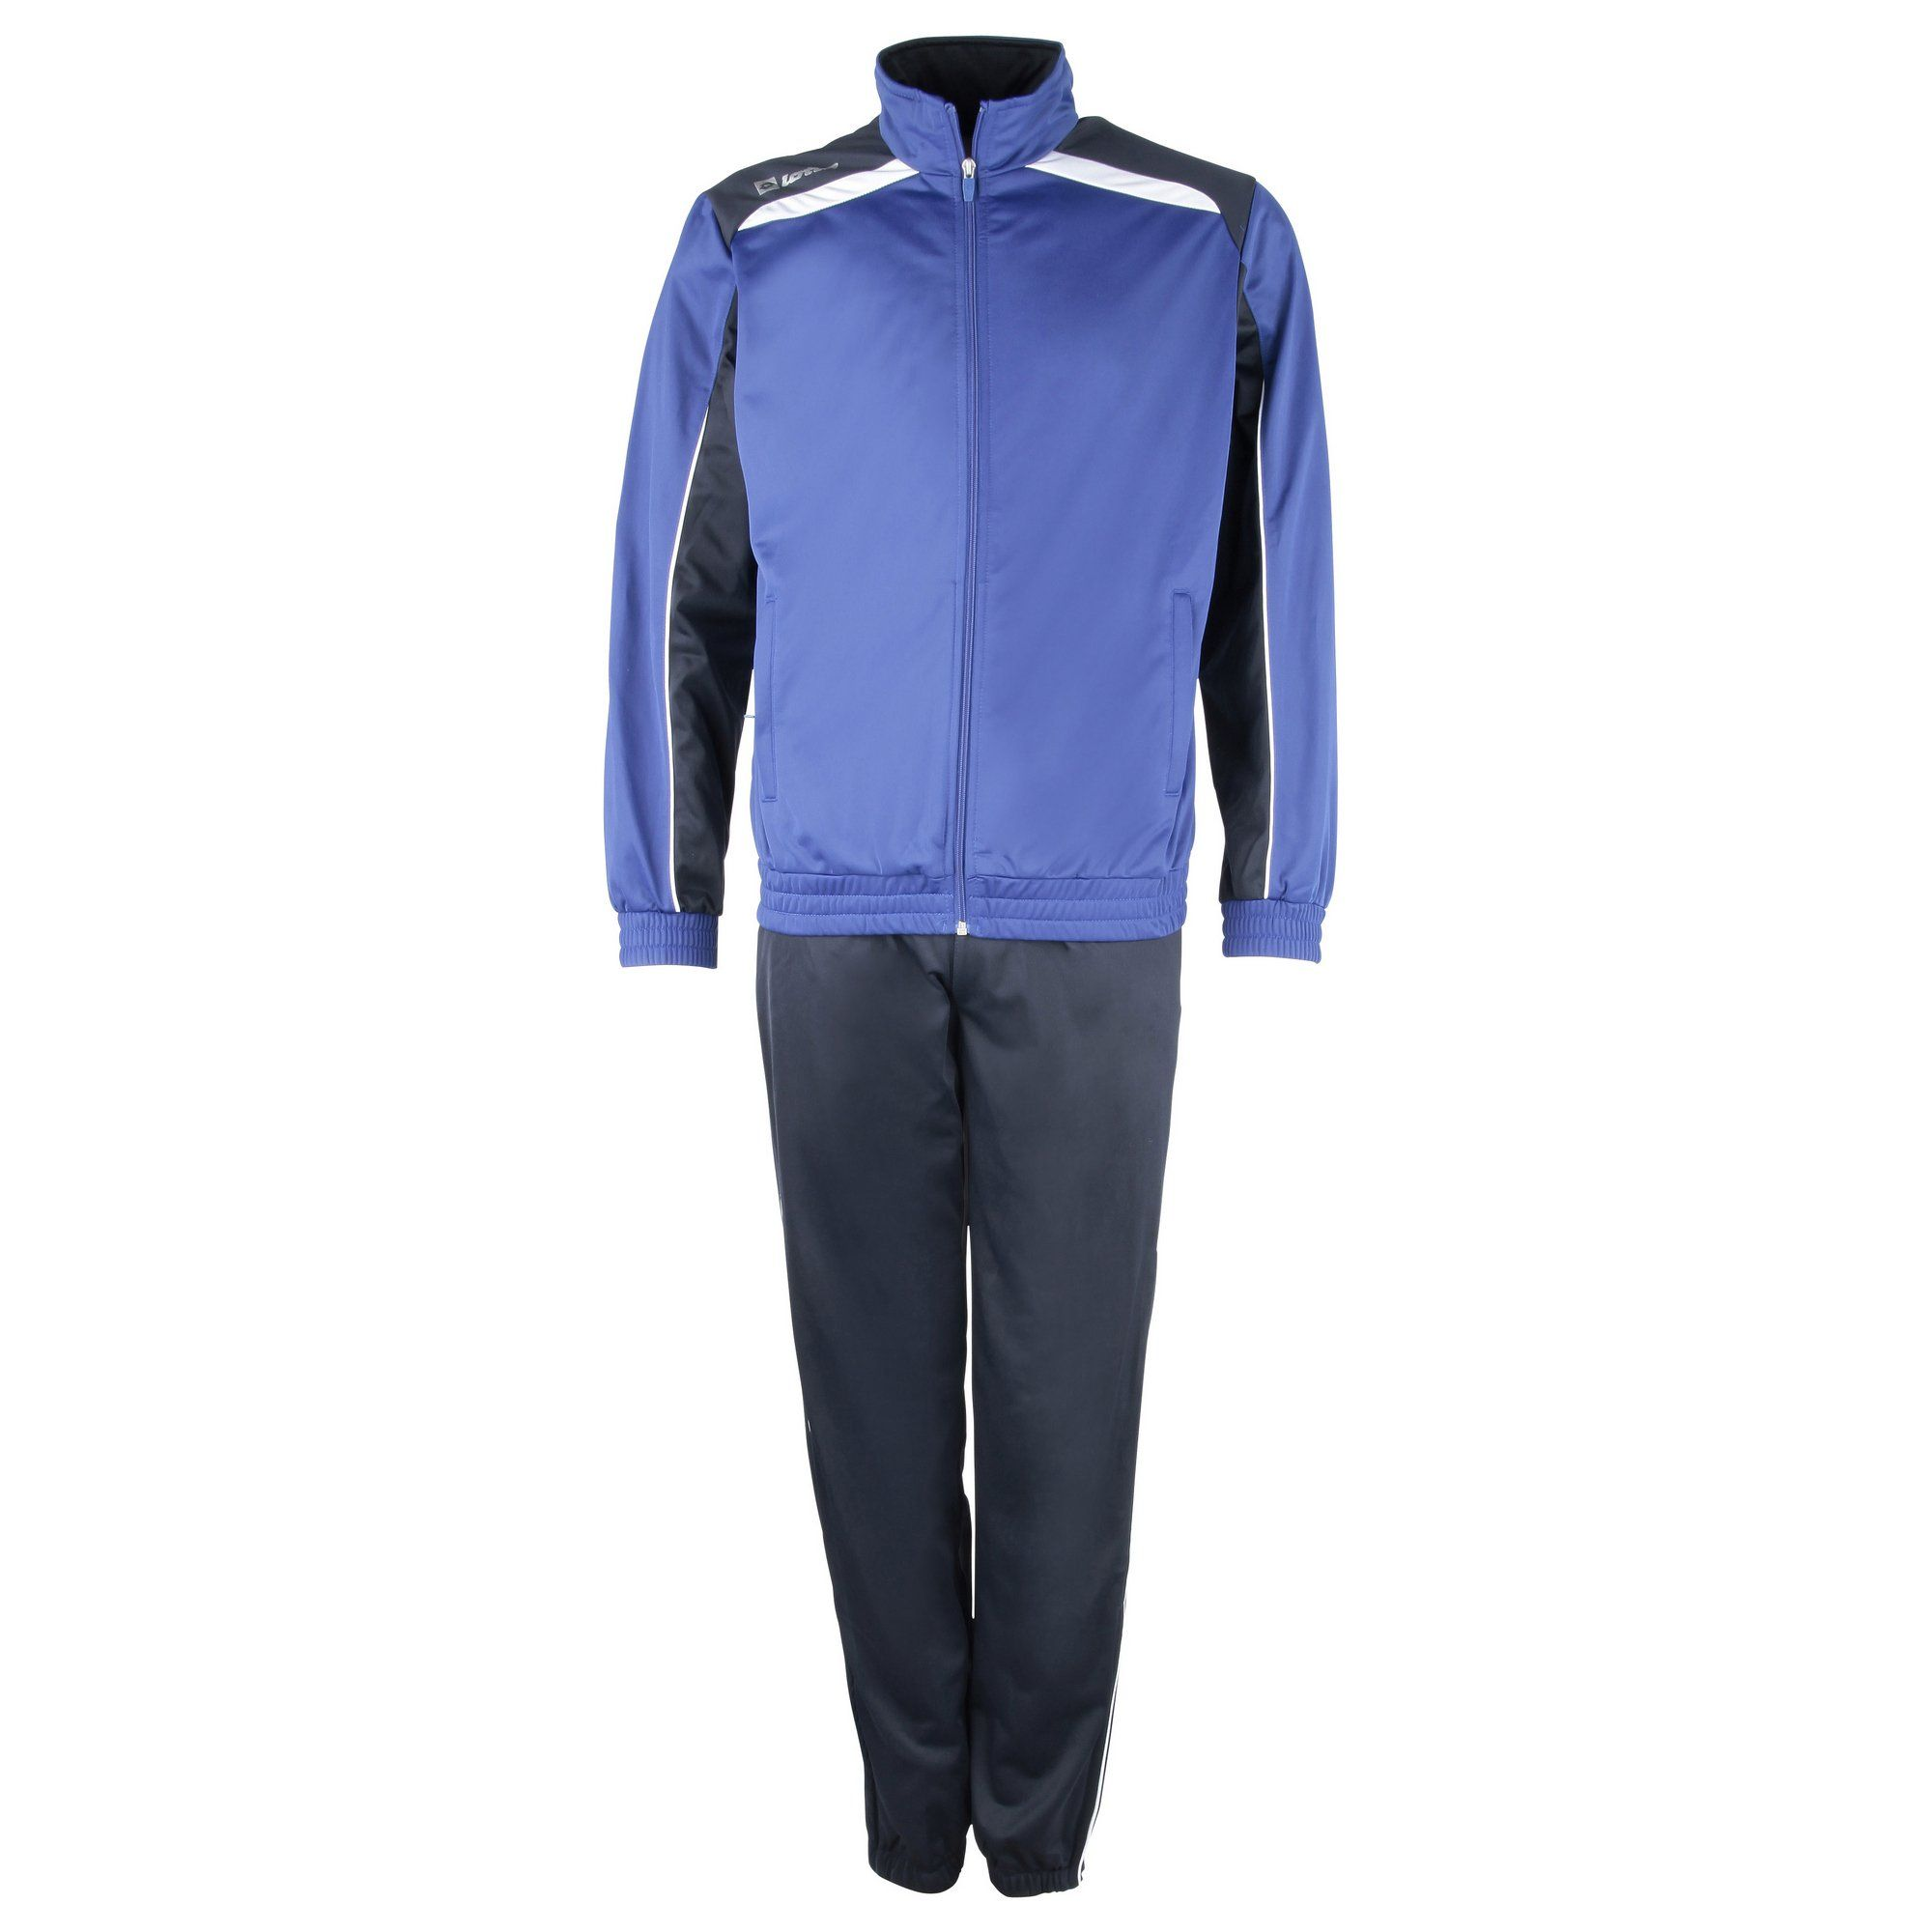 d3e55f2b0b Amazon.com: Lotto Mens Football Track Suit Assist PL Cuff Tracksuit ...